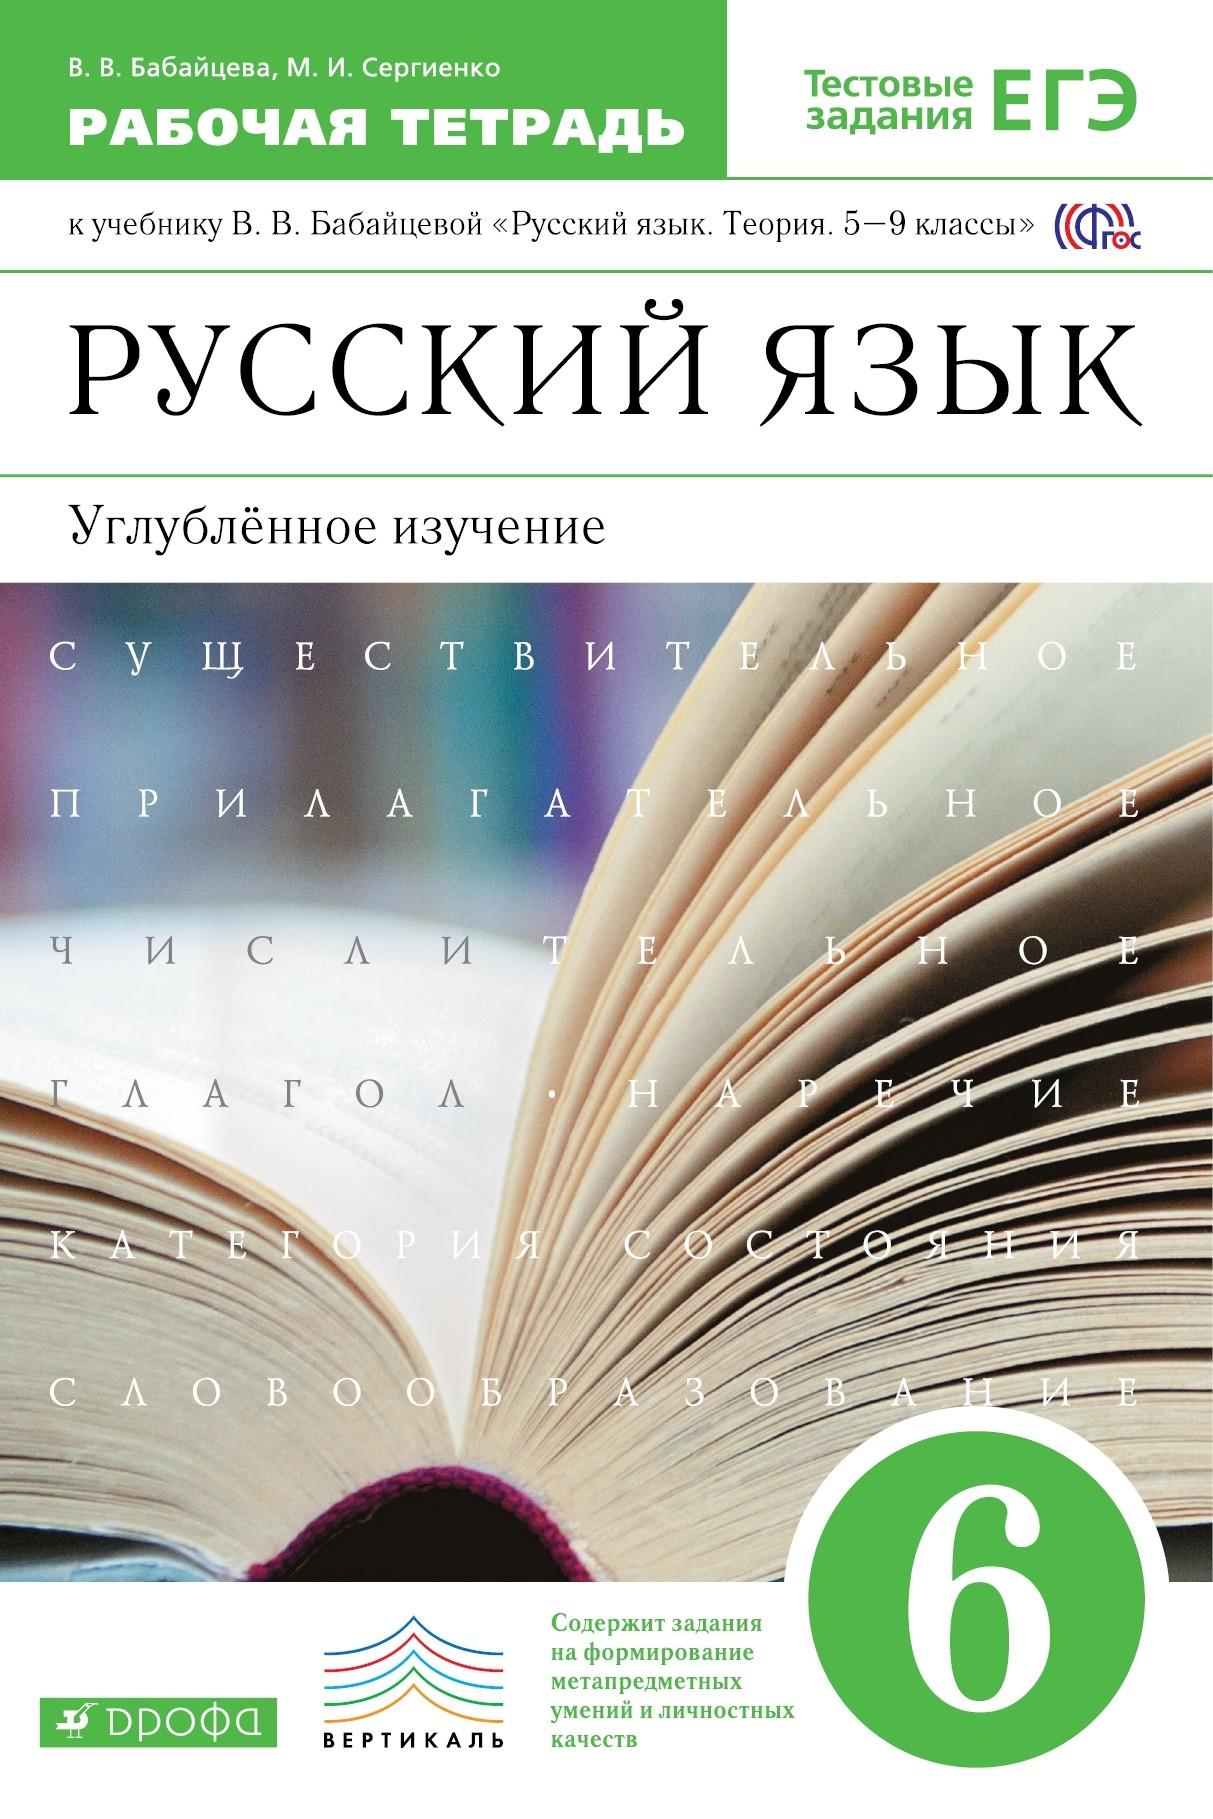 Бабайцевой 6 по класс гдз русскому